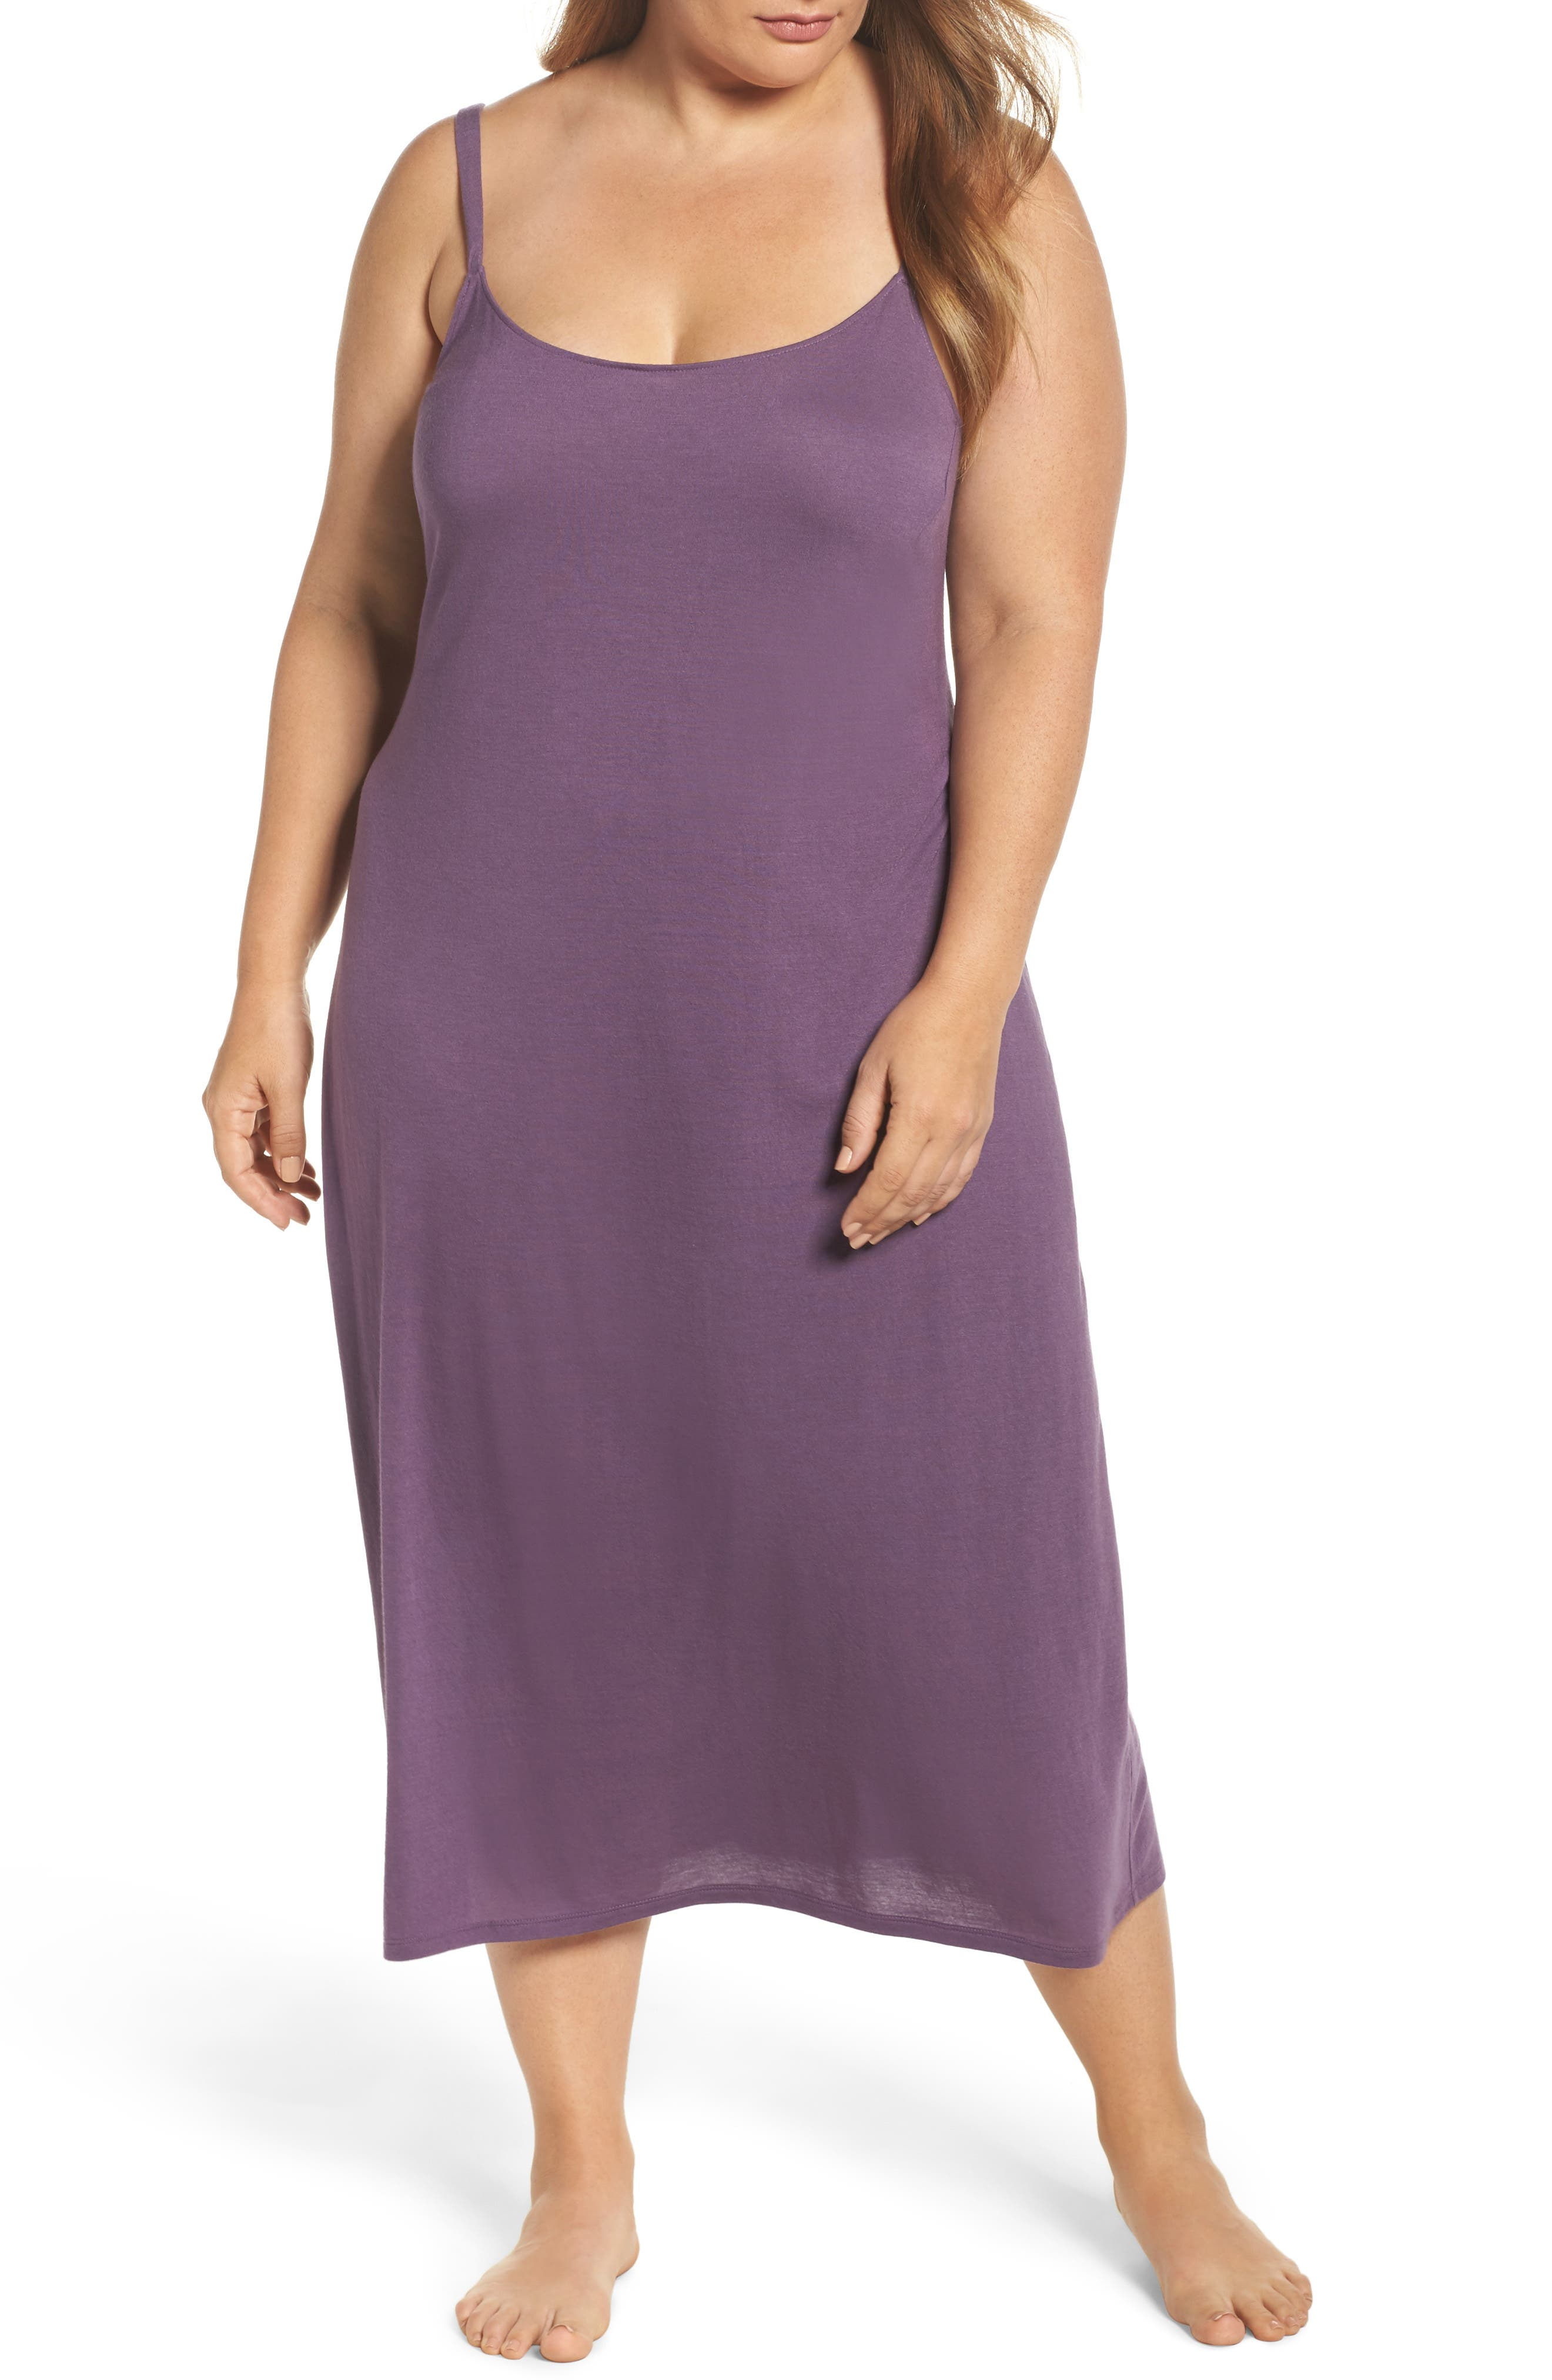 'Shangri La' Nightgown,                         Main,                         color, 520